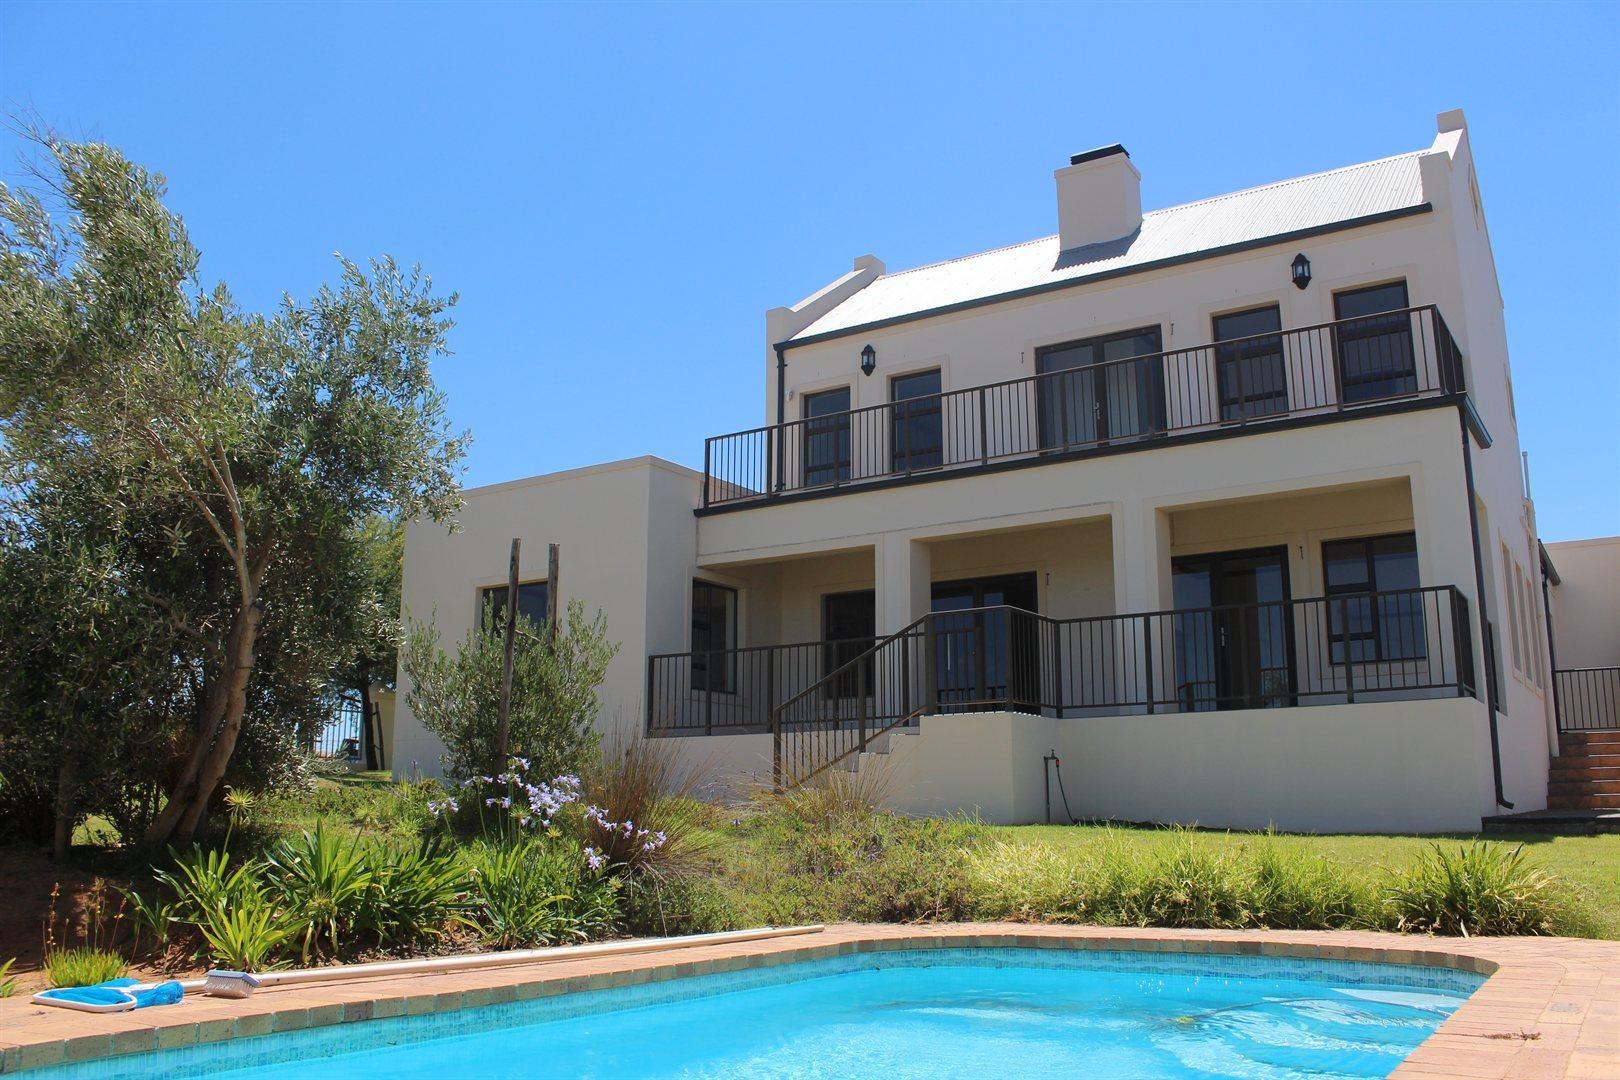 Malmesbury, Tafelzicht Property  | Houses For Sale Tafelzicht, Tafelzicht, House 5 bedrooms property for sale Price:2,550,000